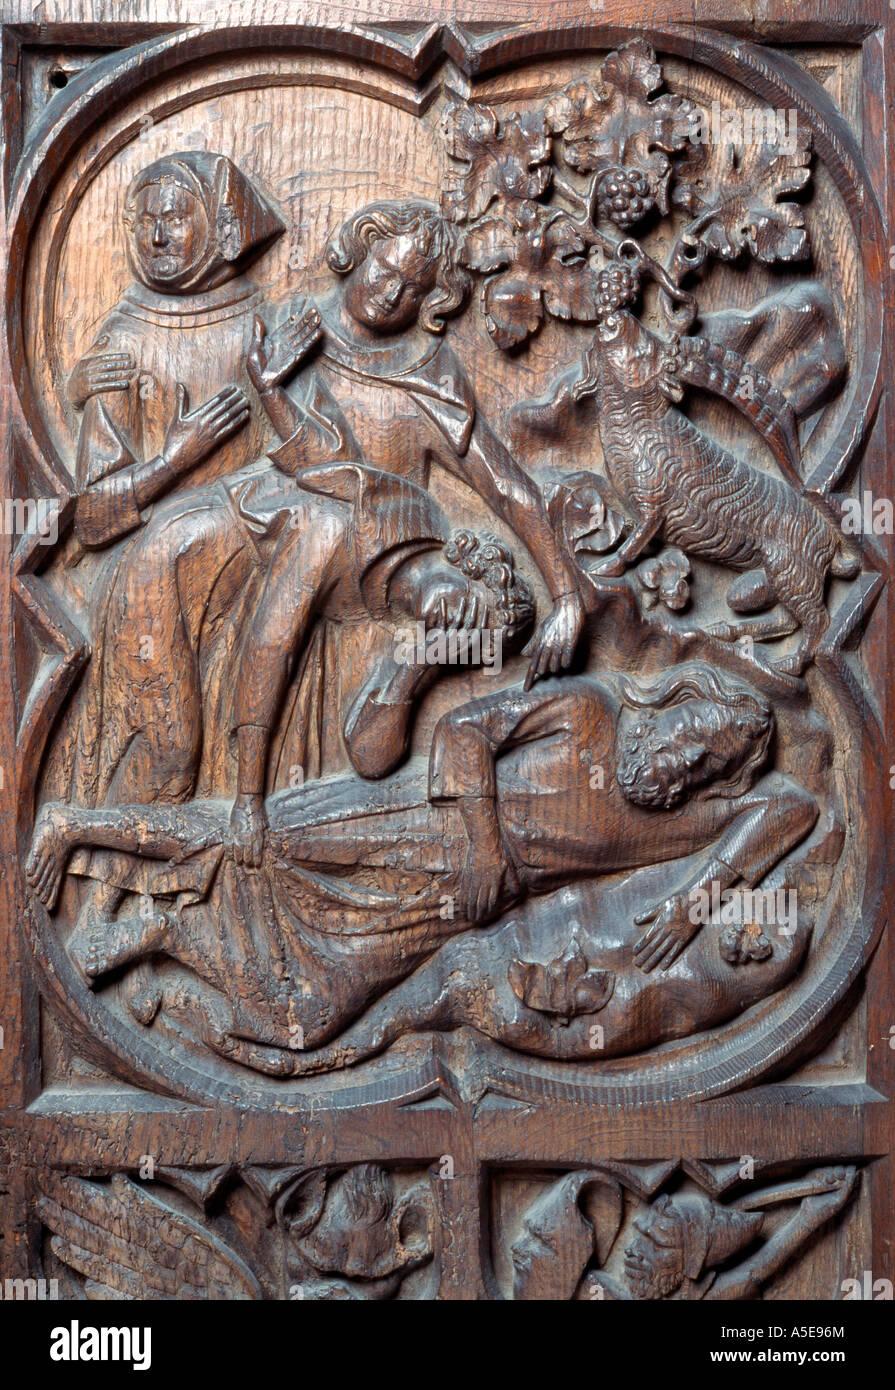 Köln, Dom, Detail des Chorgestühls - Stock Image